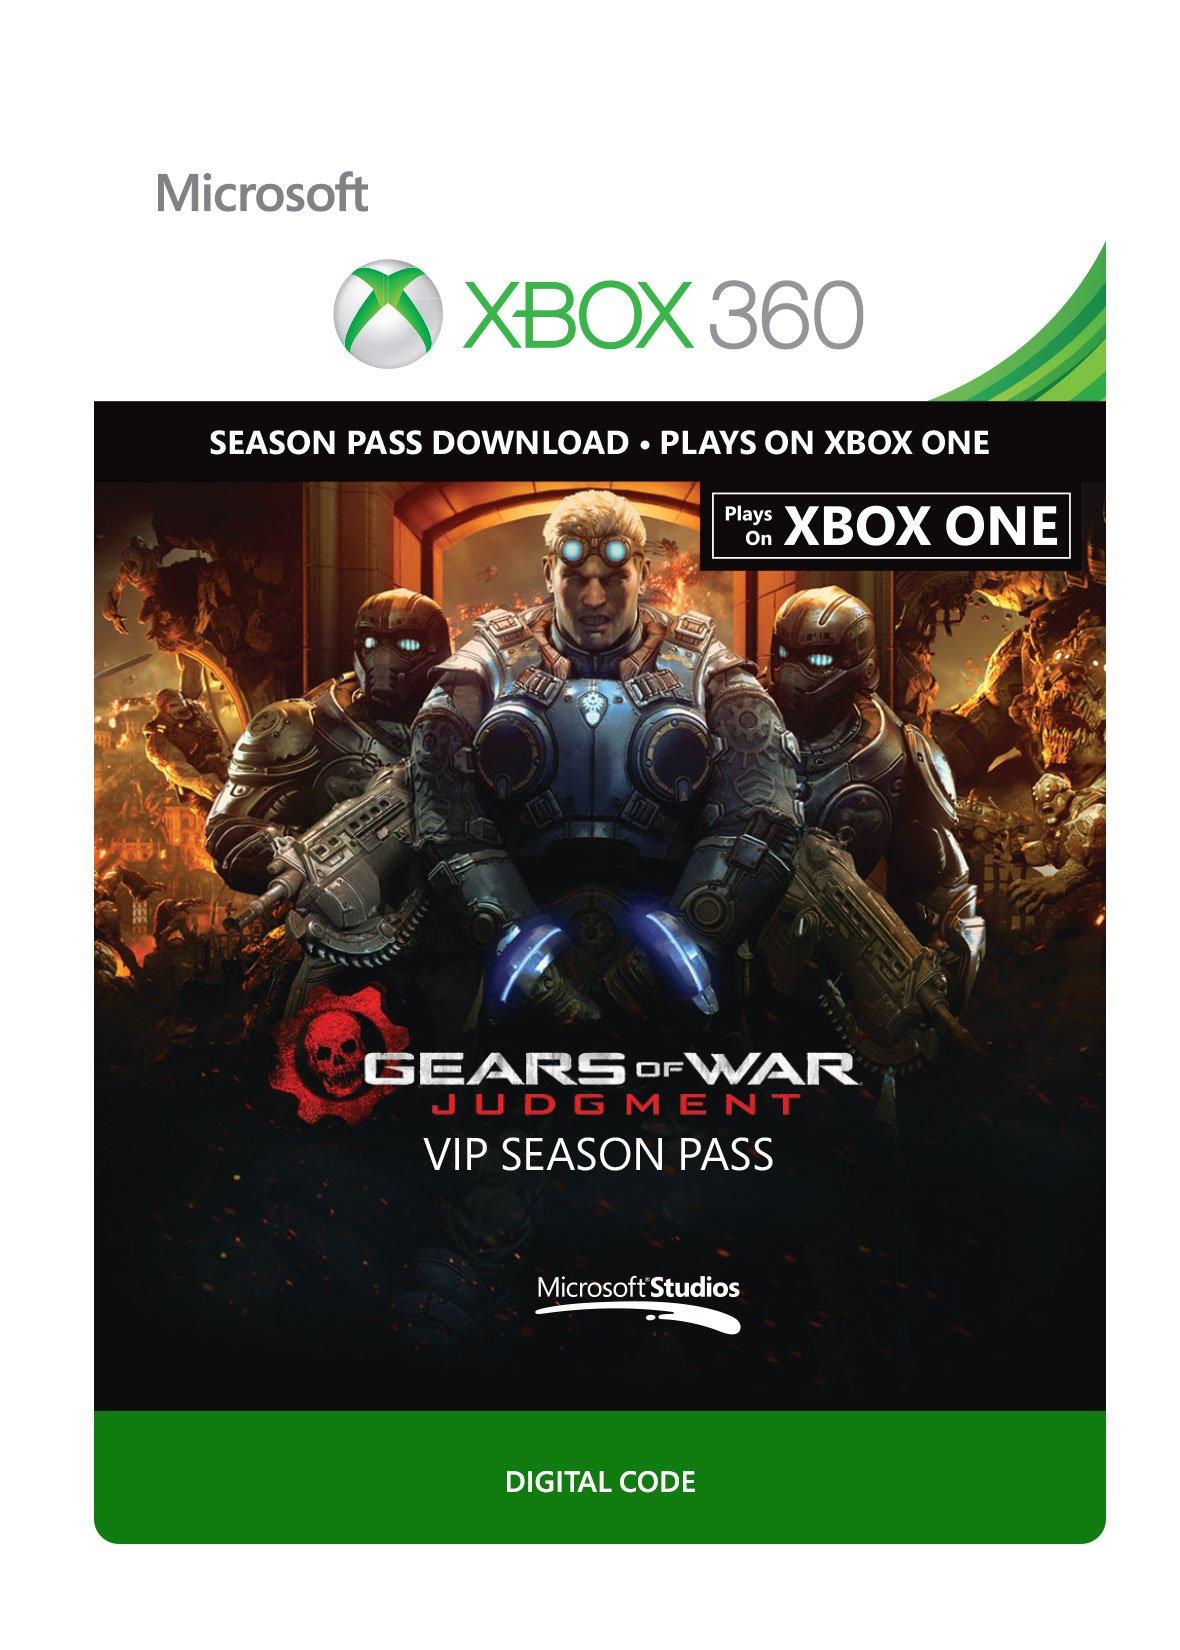 Gears of War Judgment: VIP Season Pass - Xbox 360 Digital Code